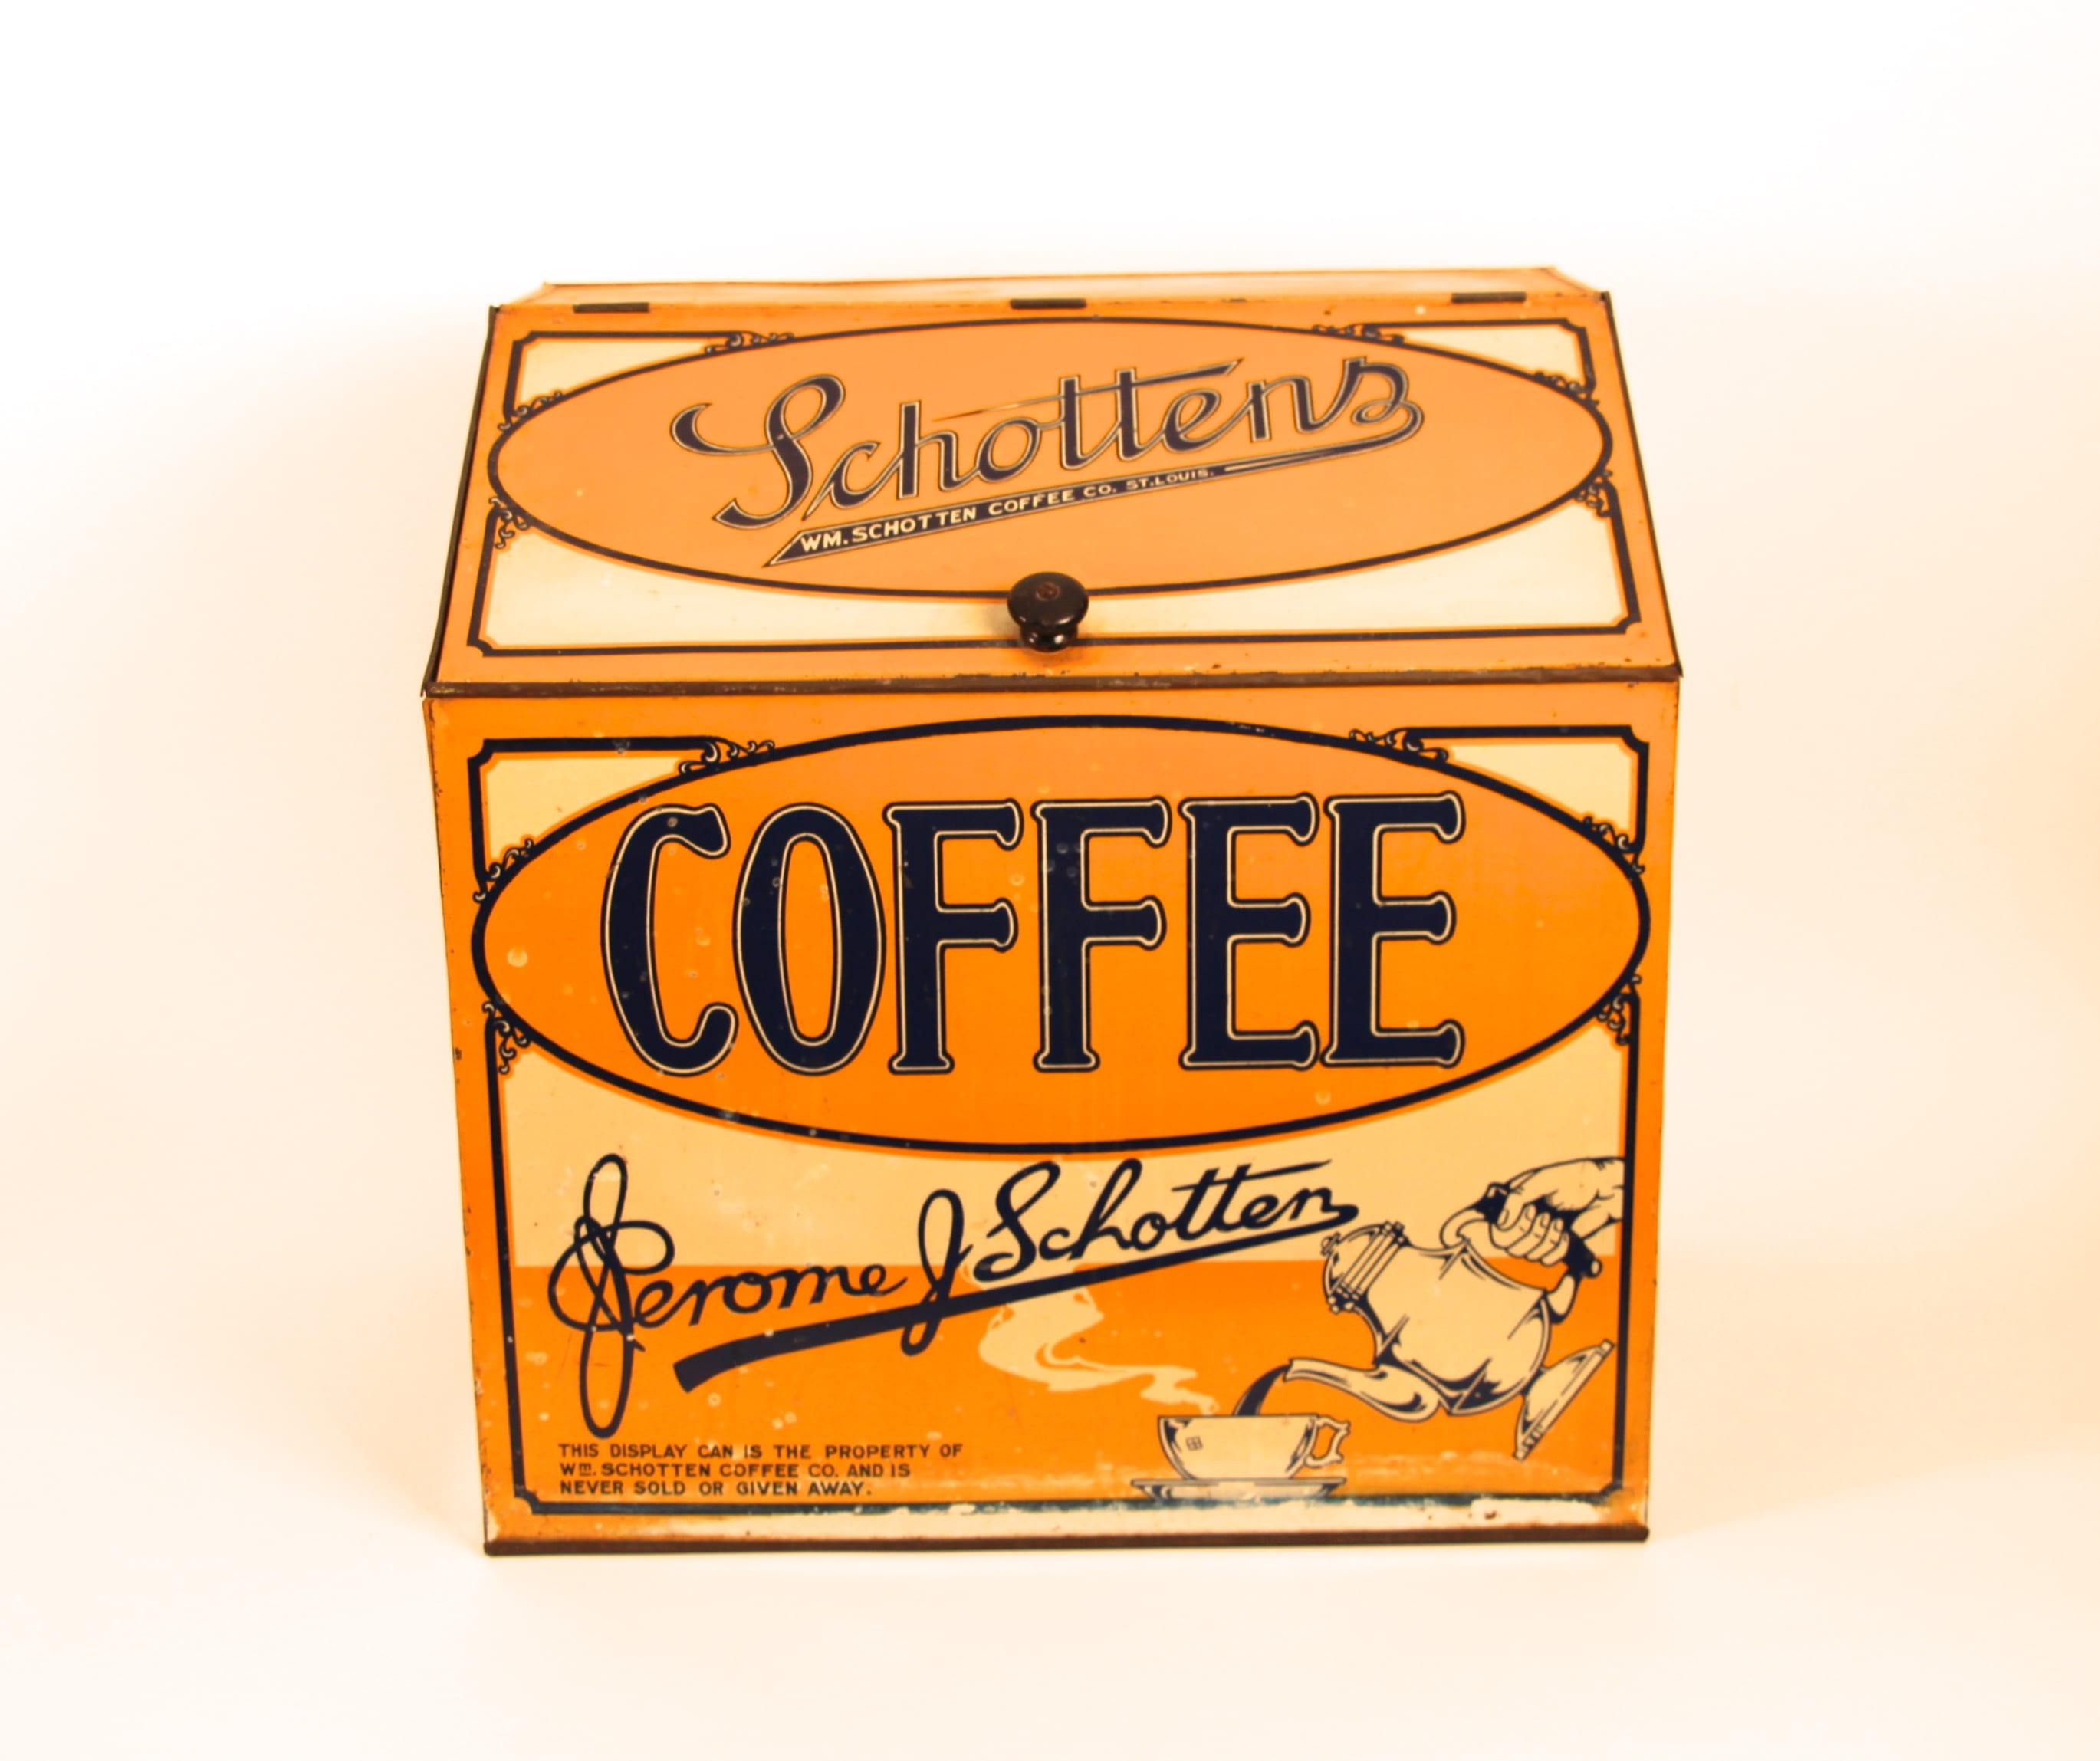 Jerome Schotten Coffee General Store Display Bin, St. Louis, MO